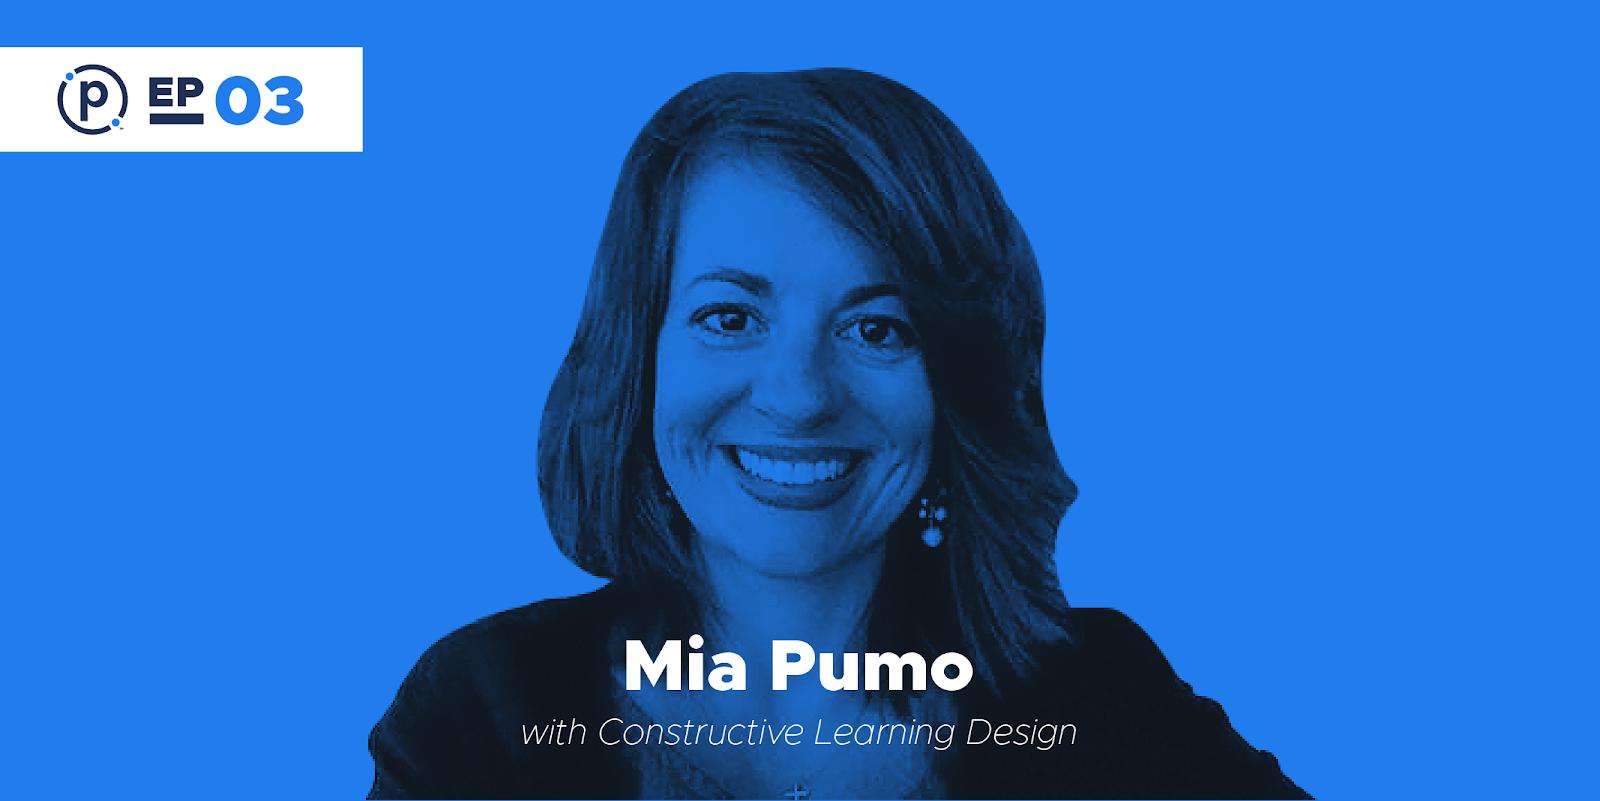 Participate Podcast: Mia Pumo from Constructive Learning Design